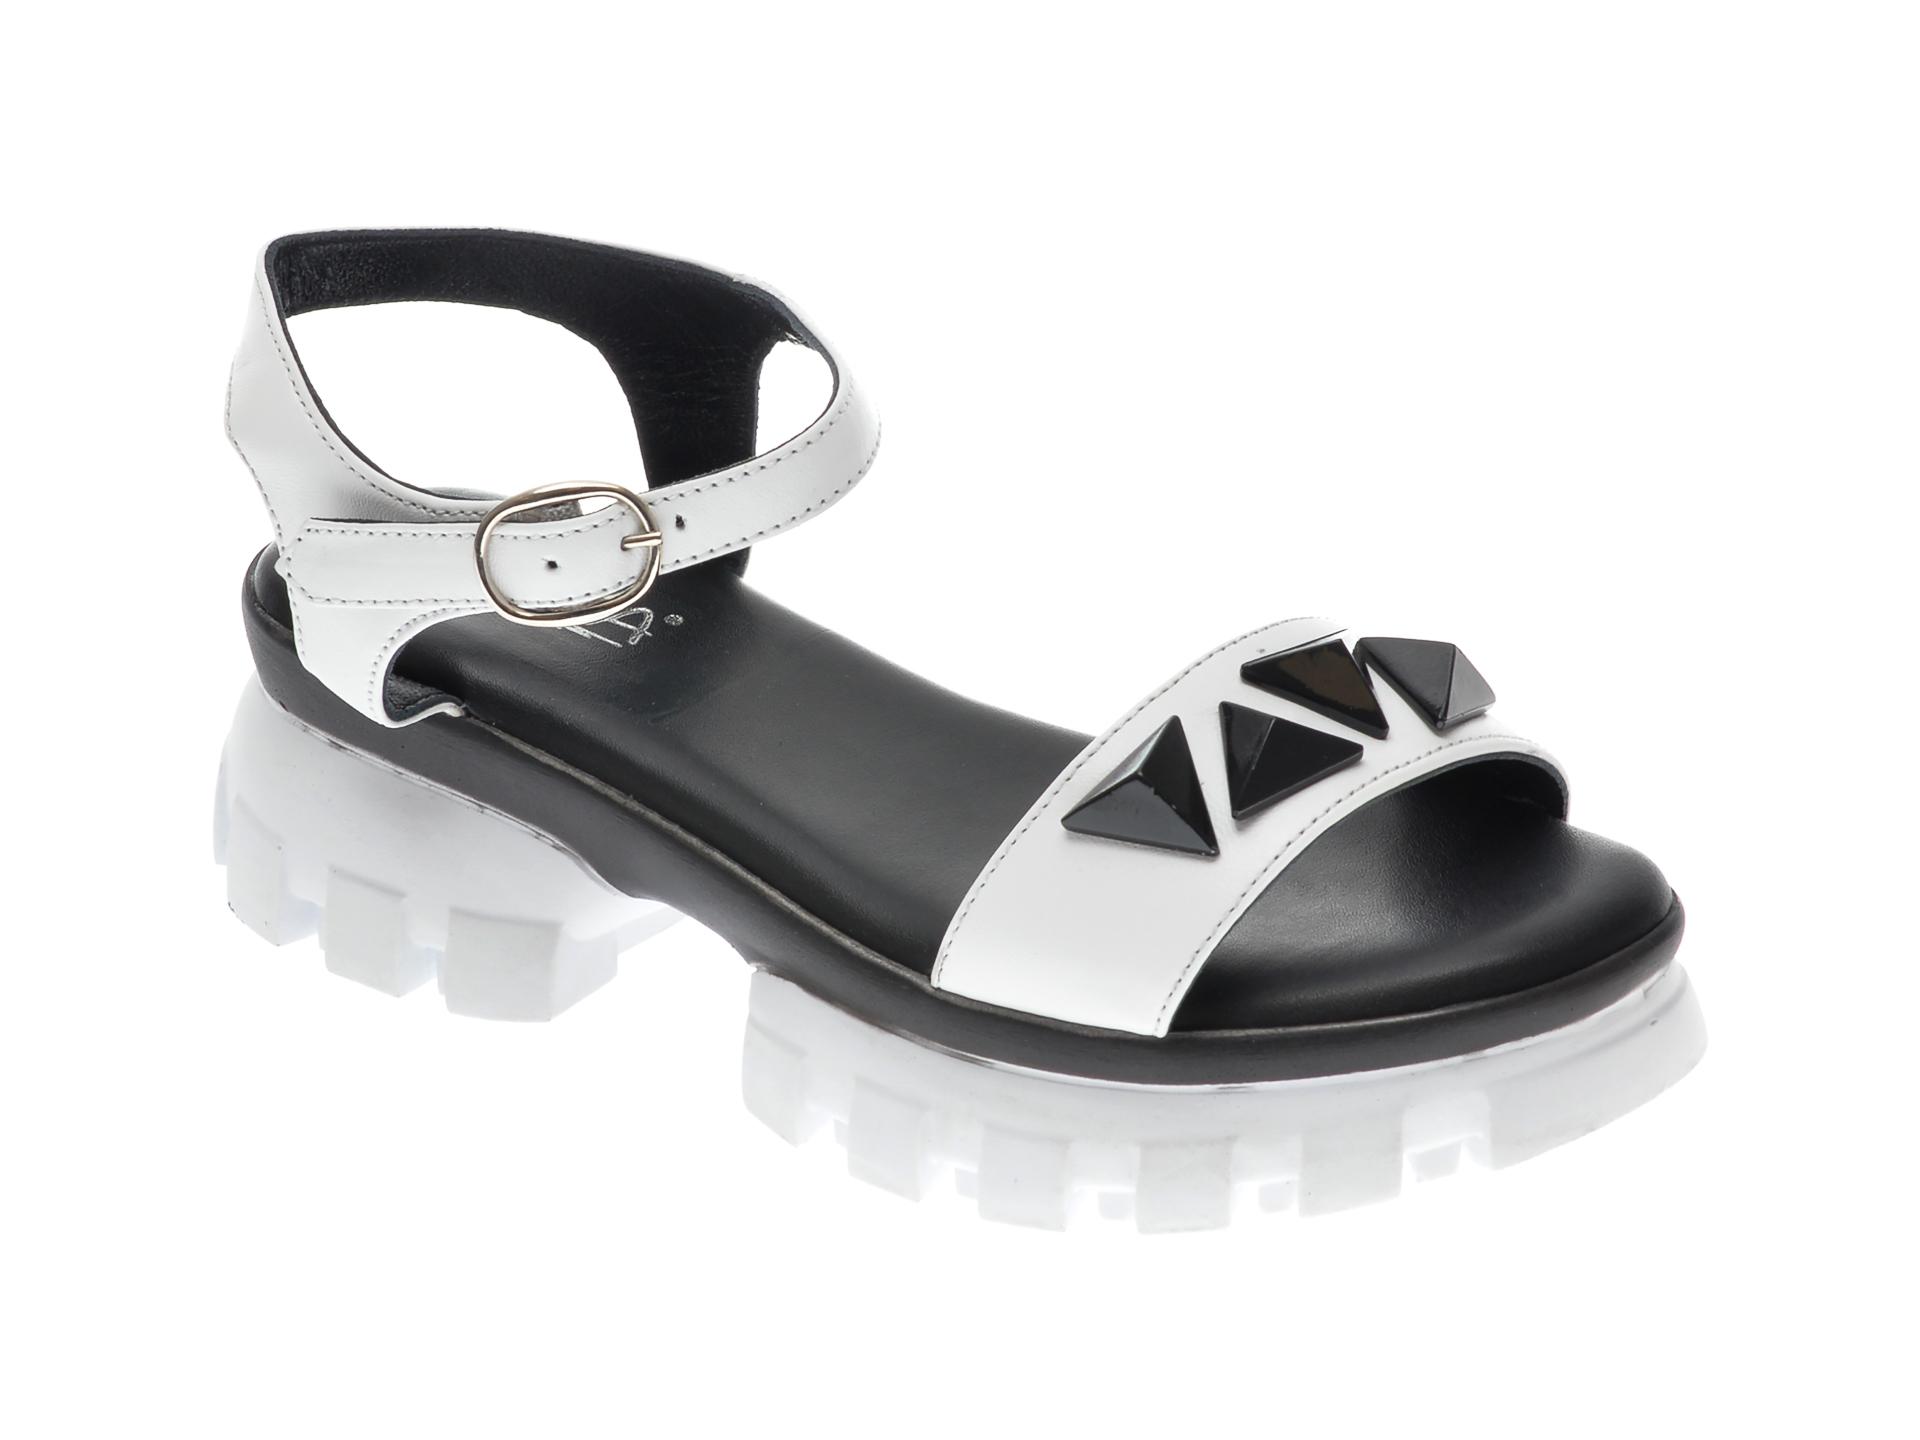 Sandale UNICA albe, A6734, din piele naturala imagine otter.ro 2021